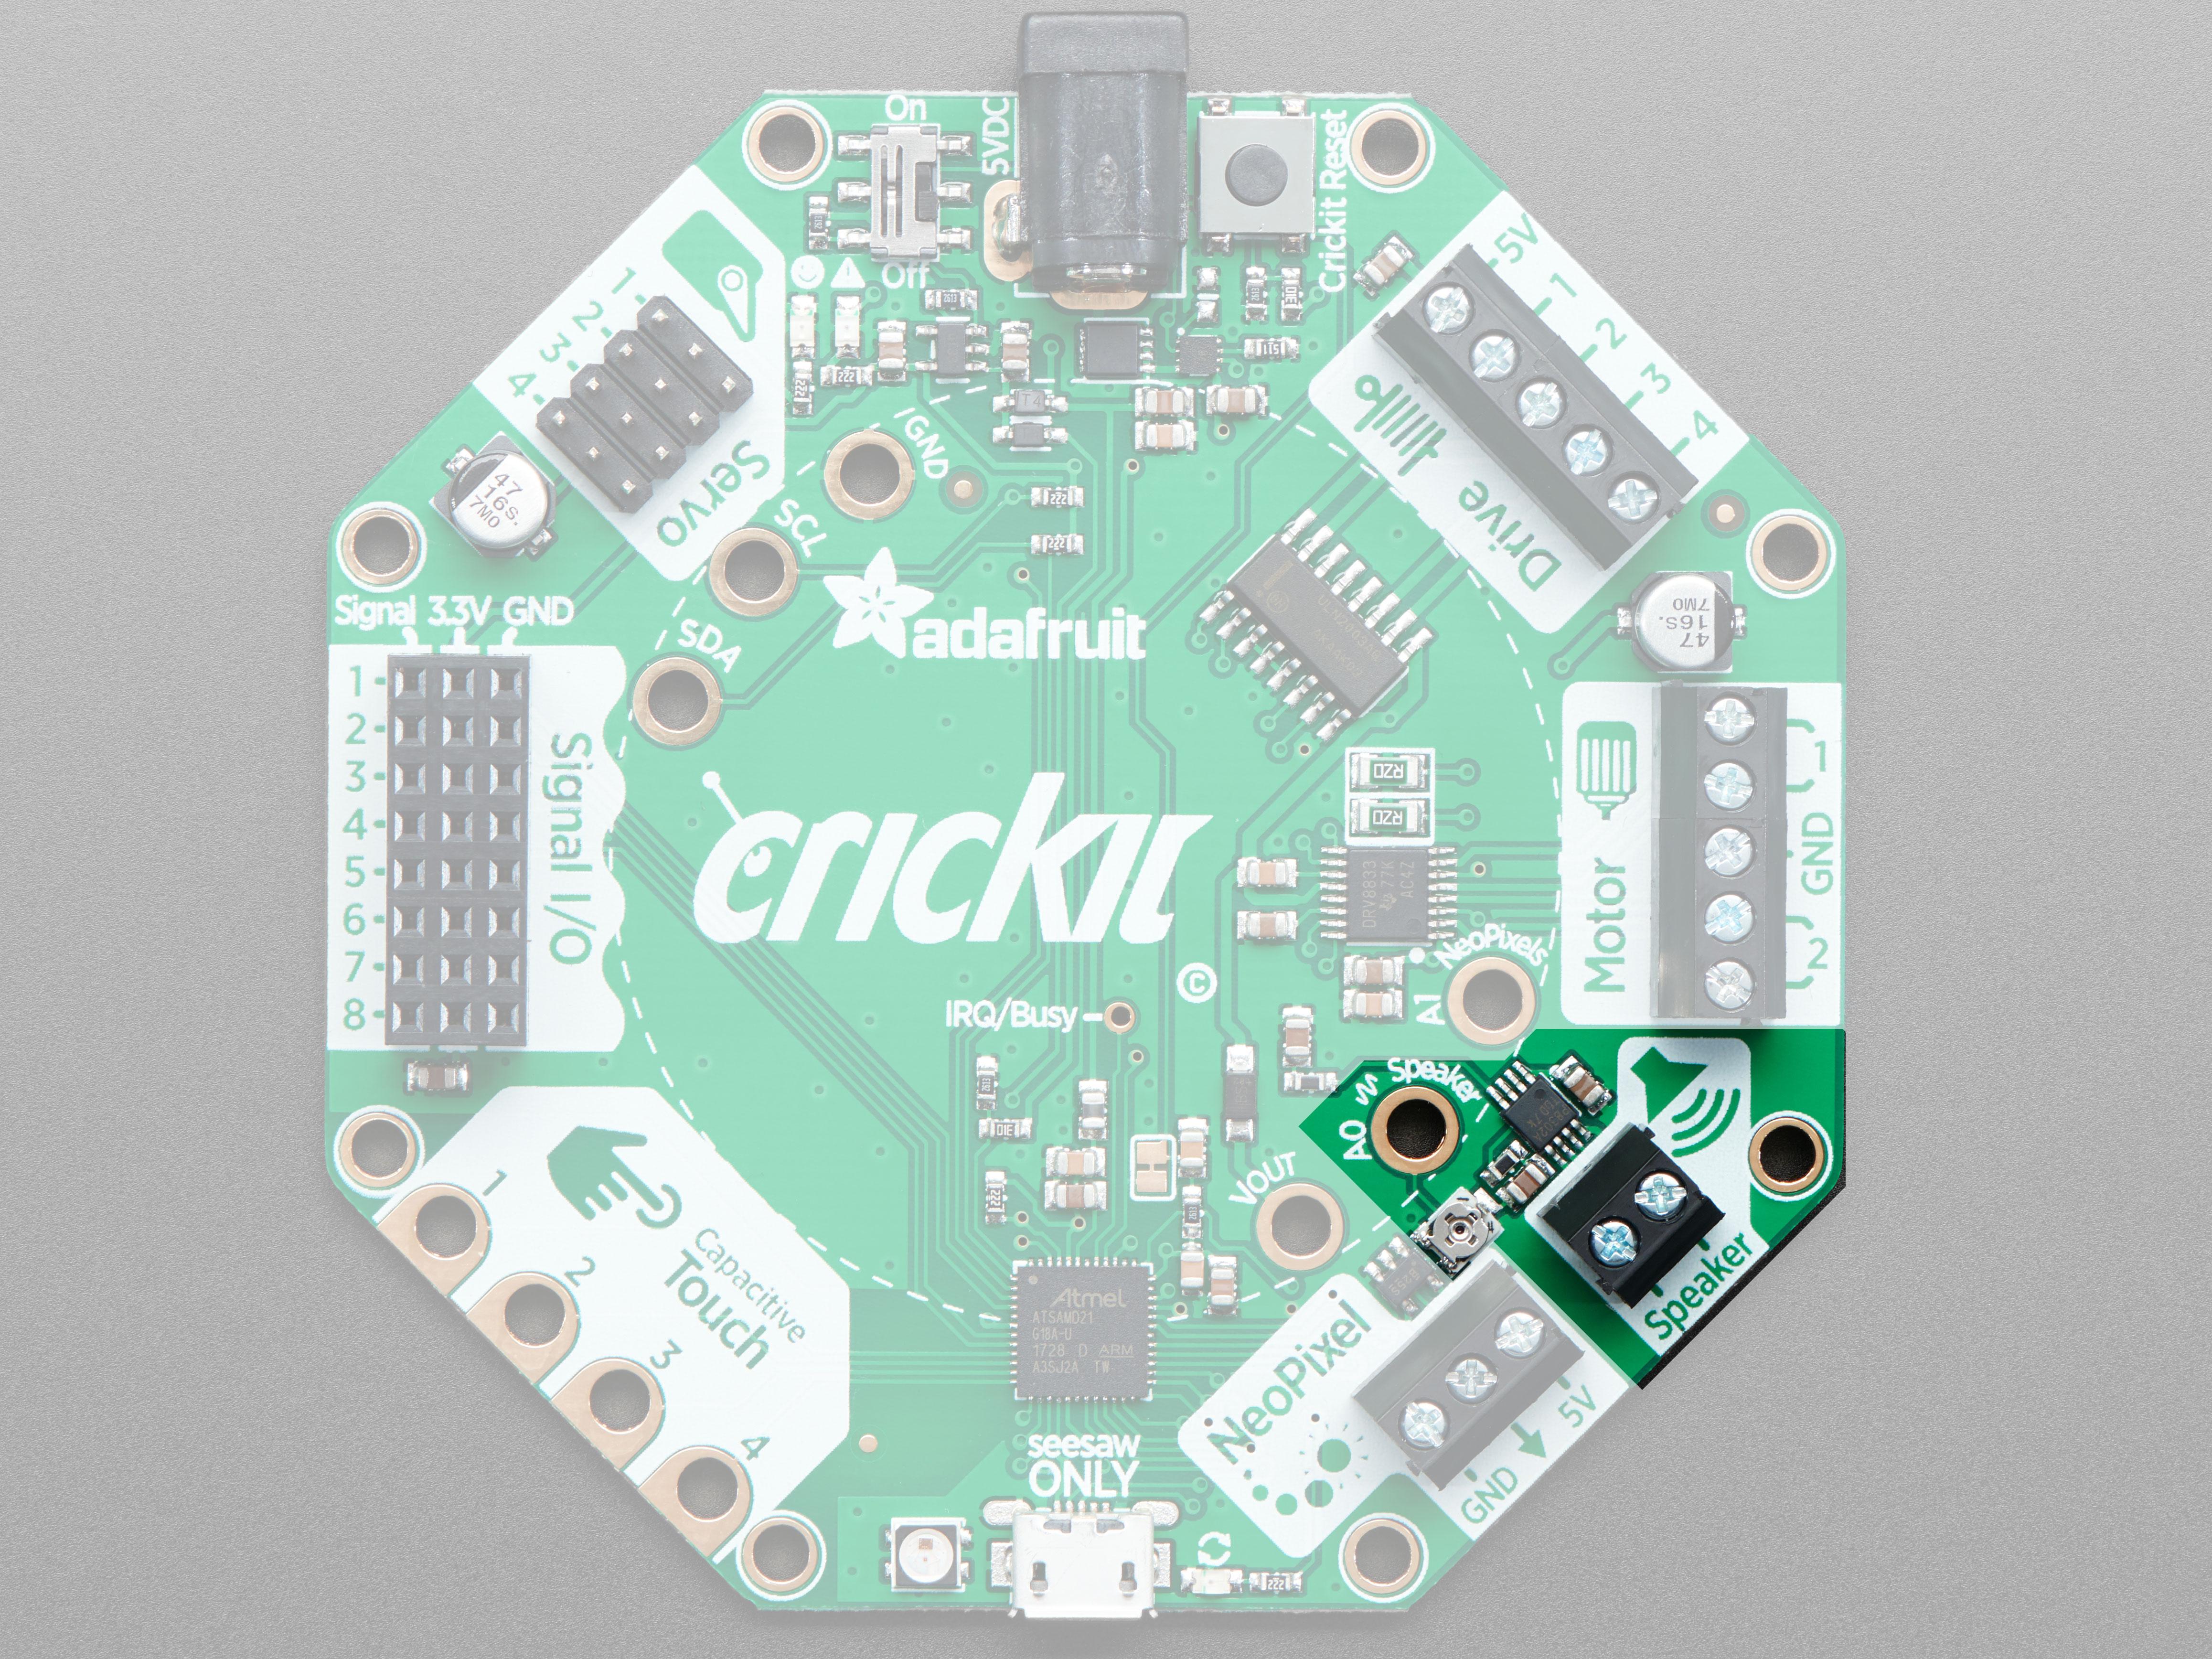 circuit_playground_spkr.jpg